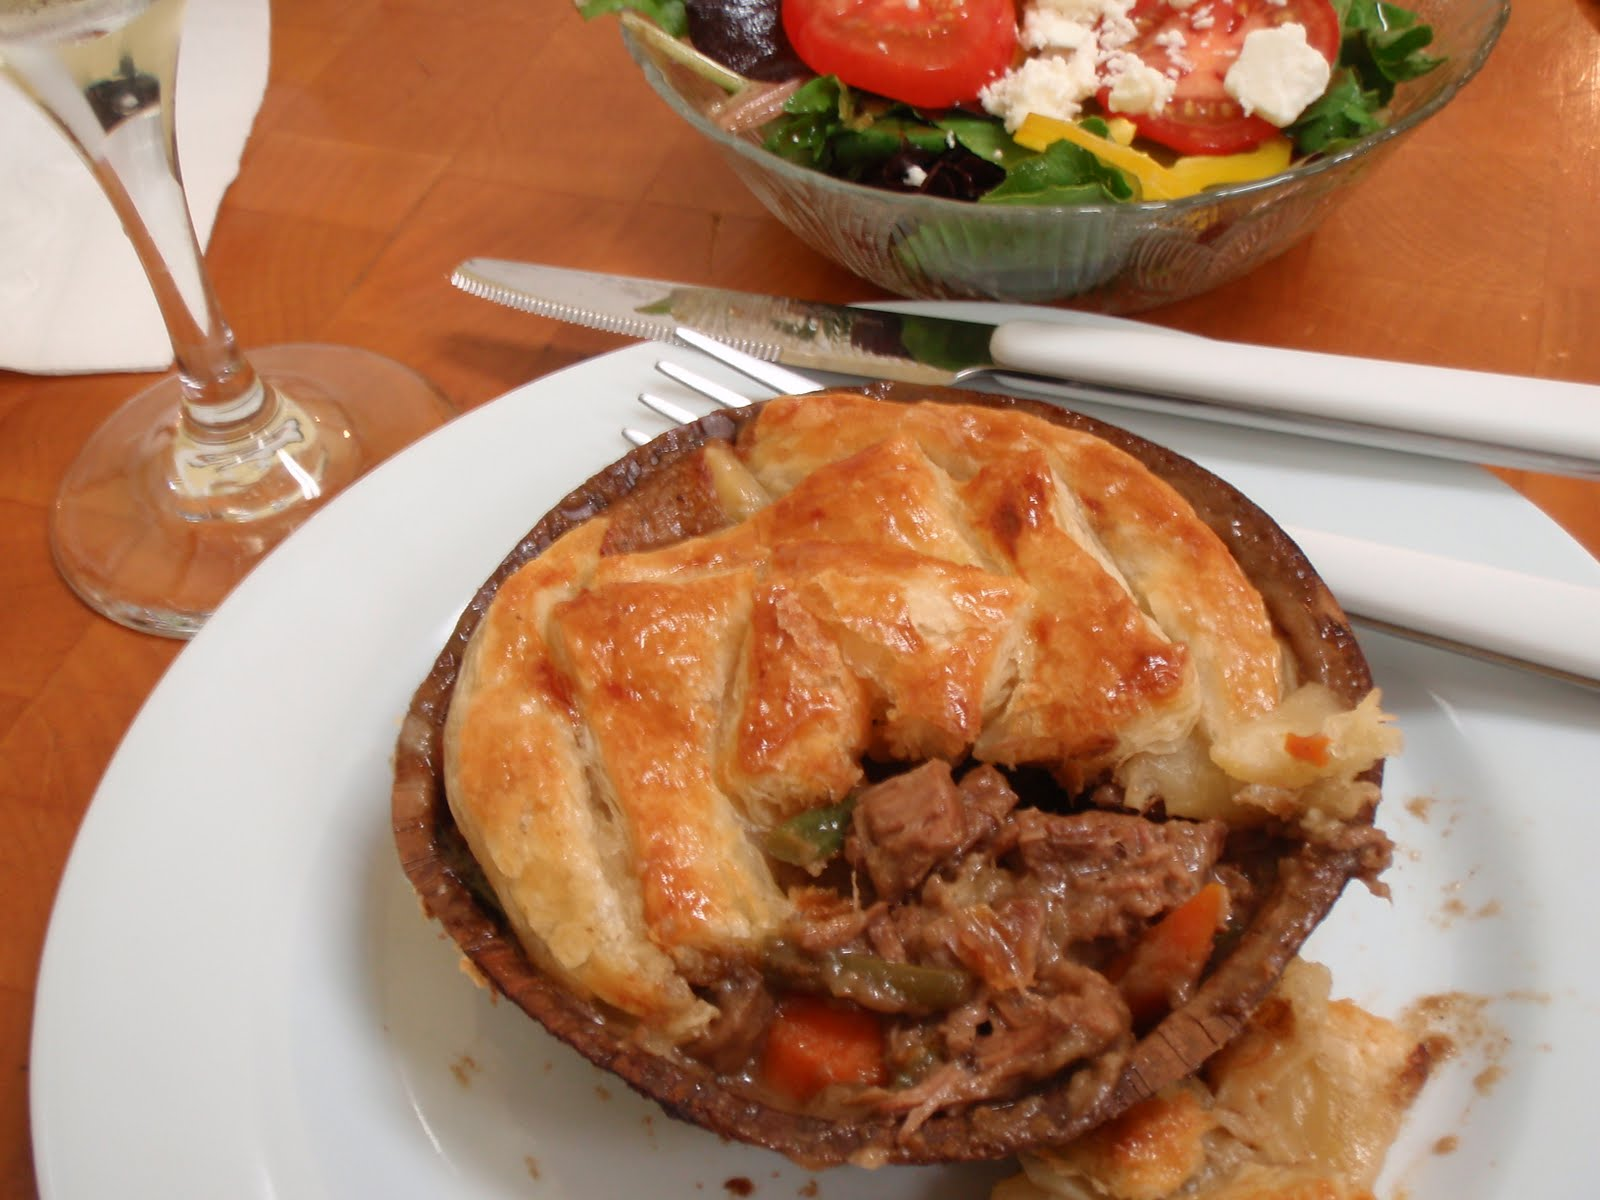 Recipe for Steak and Guinness Pub Pie